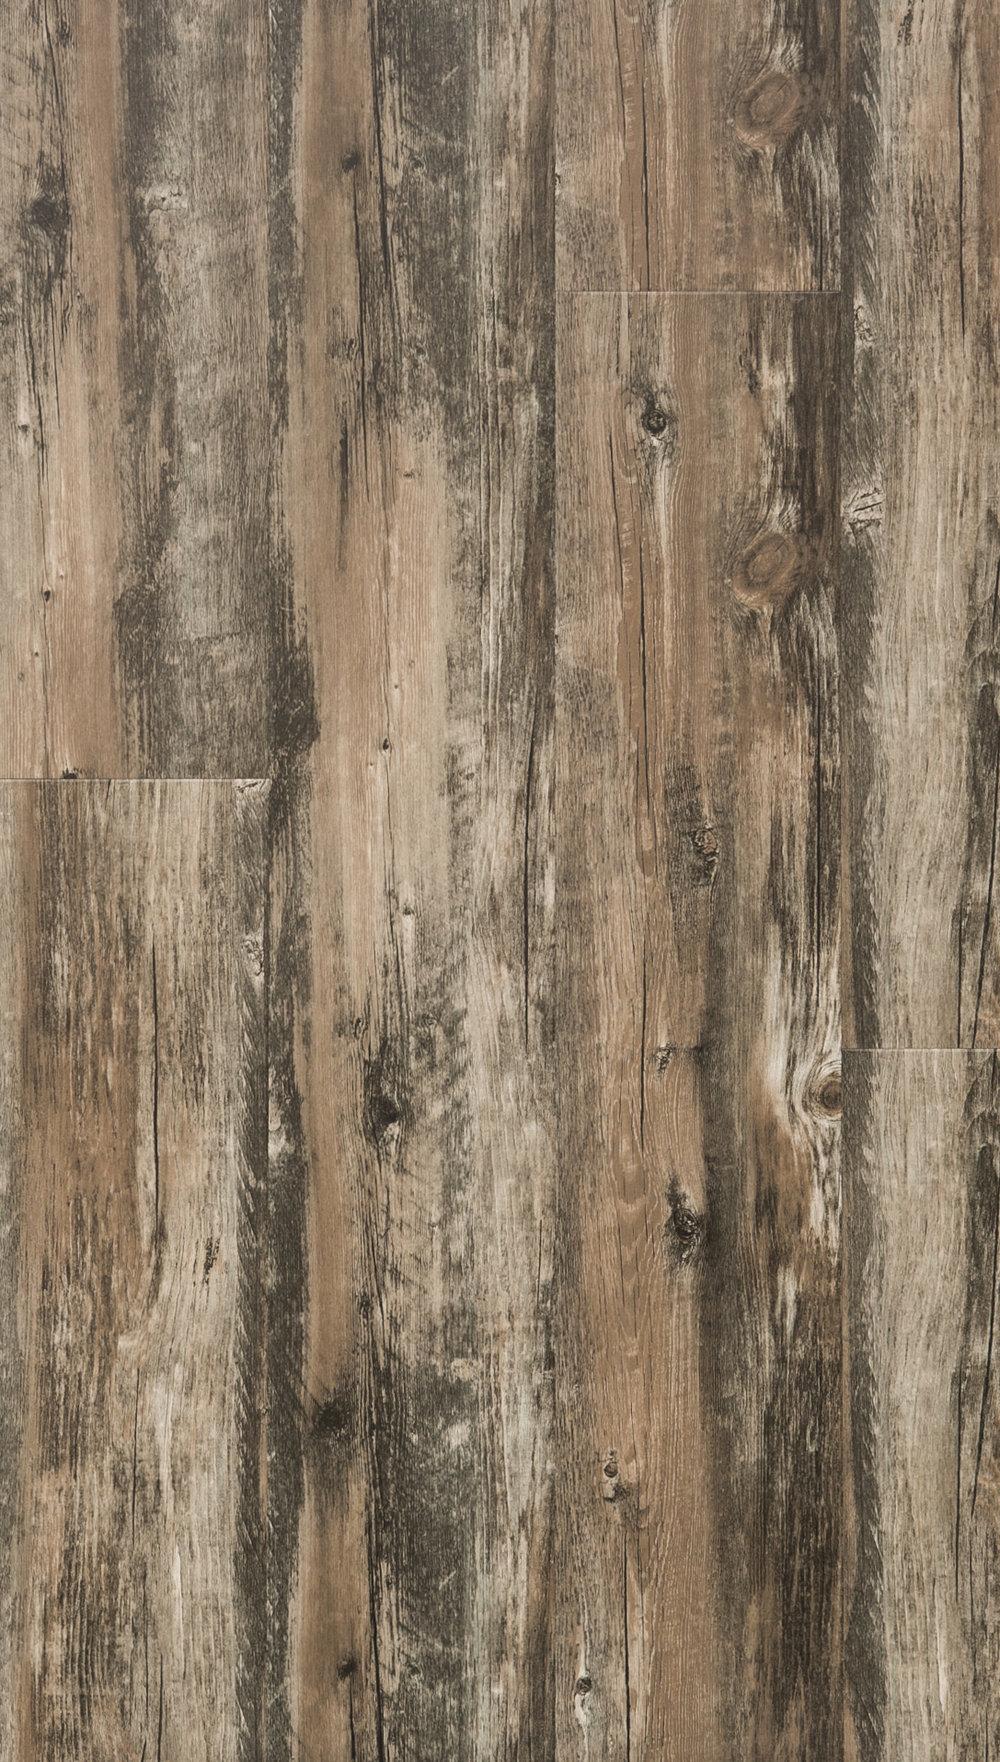 W5012 - Driftwood Pine